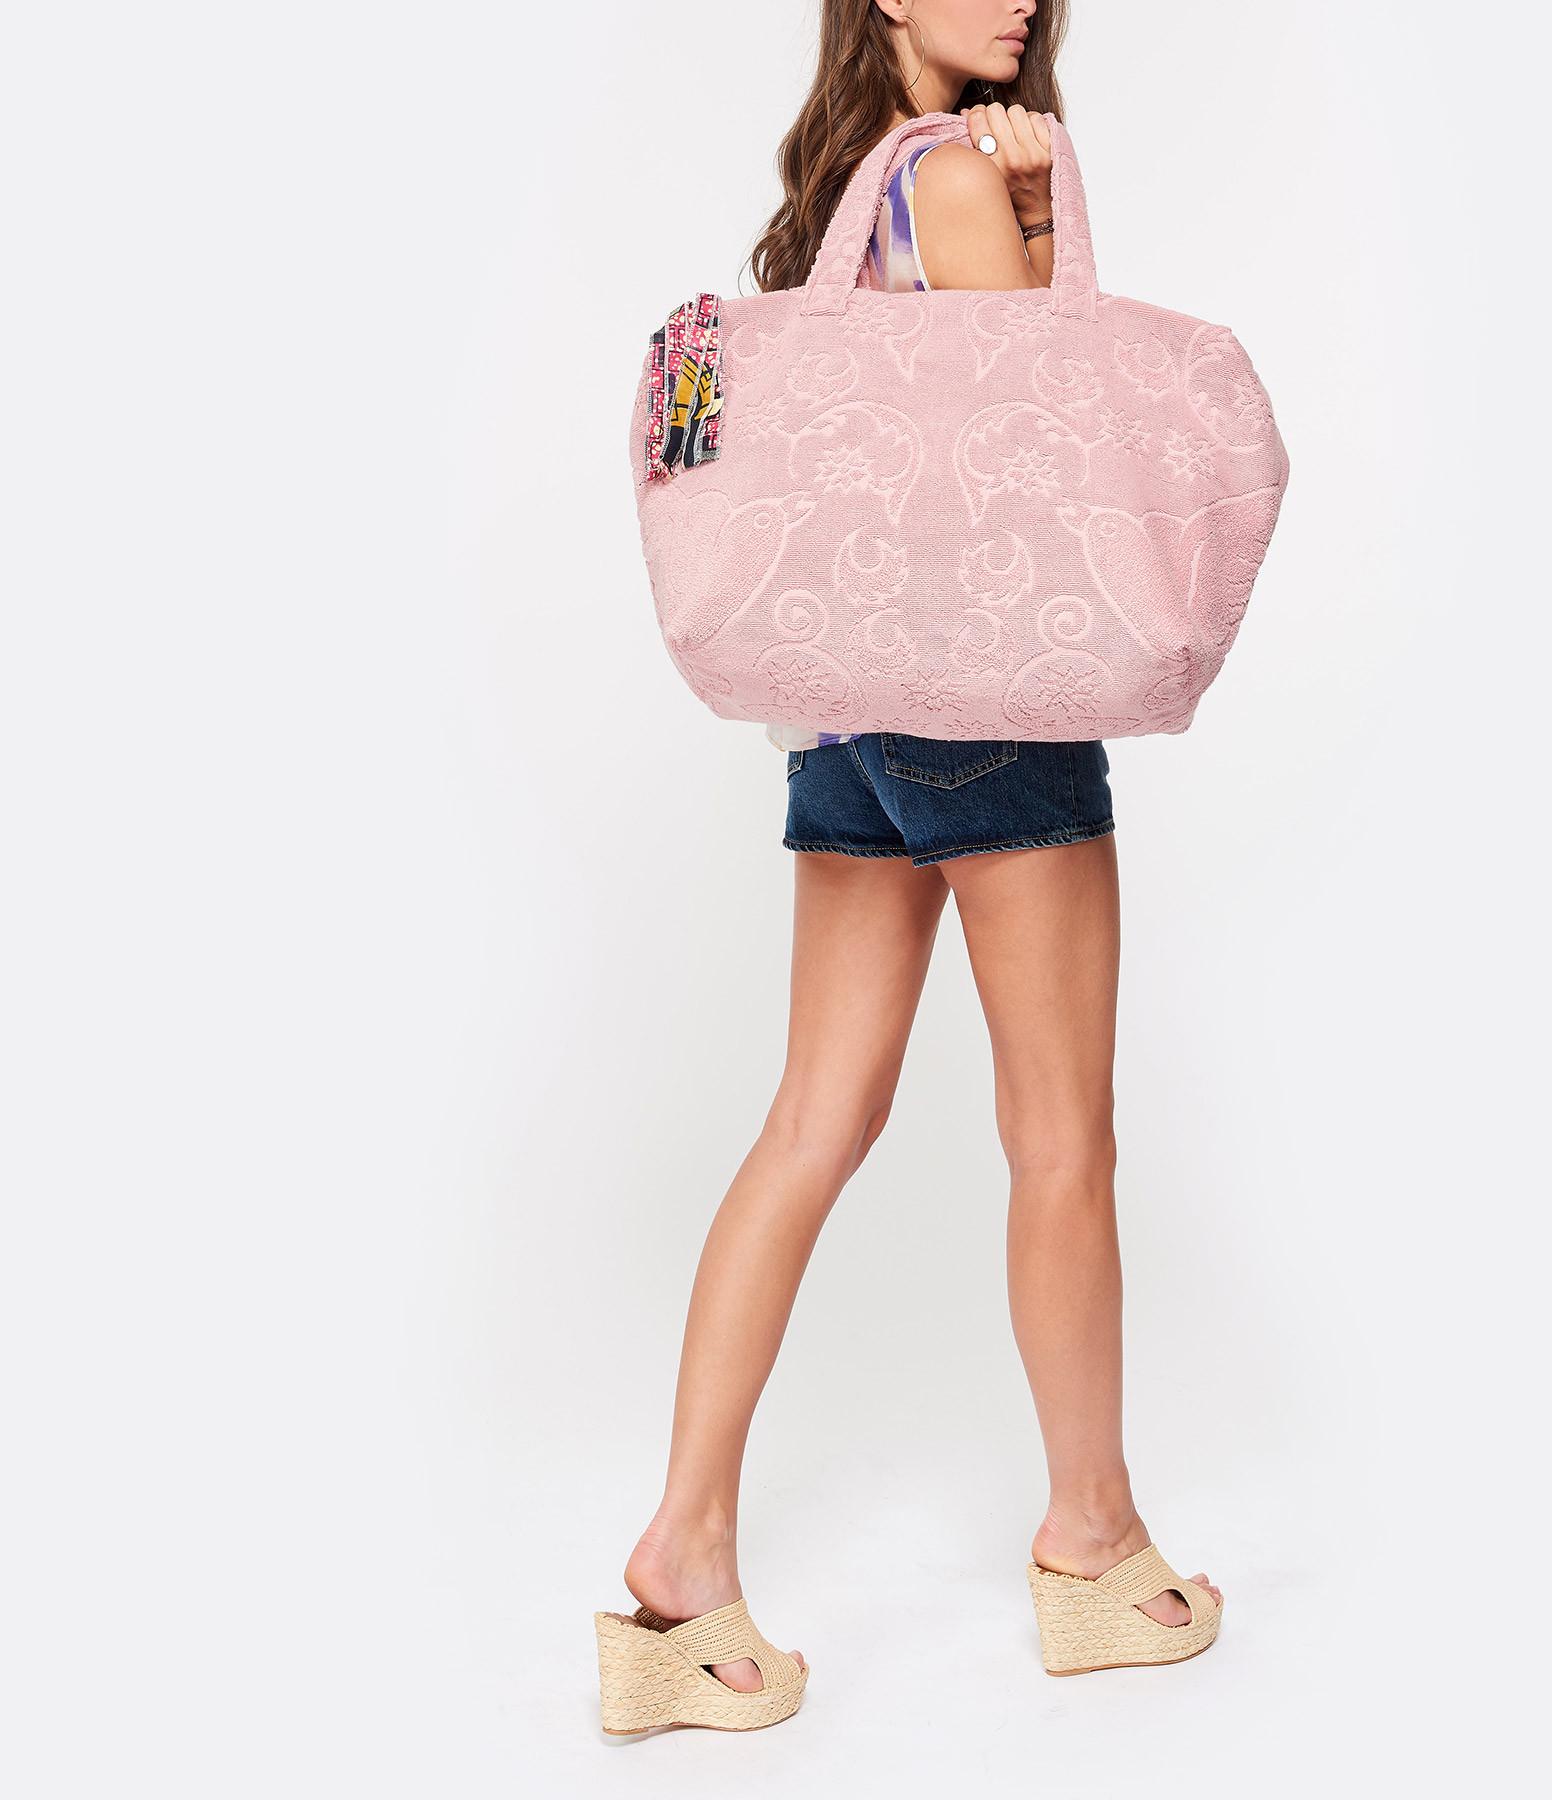 LALLA - Sac de Plage Socco Eponge Blush